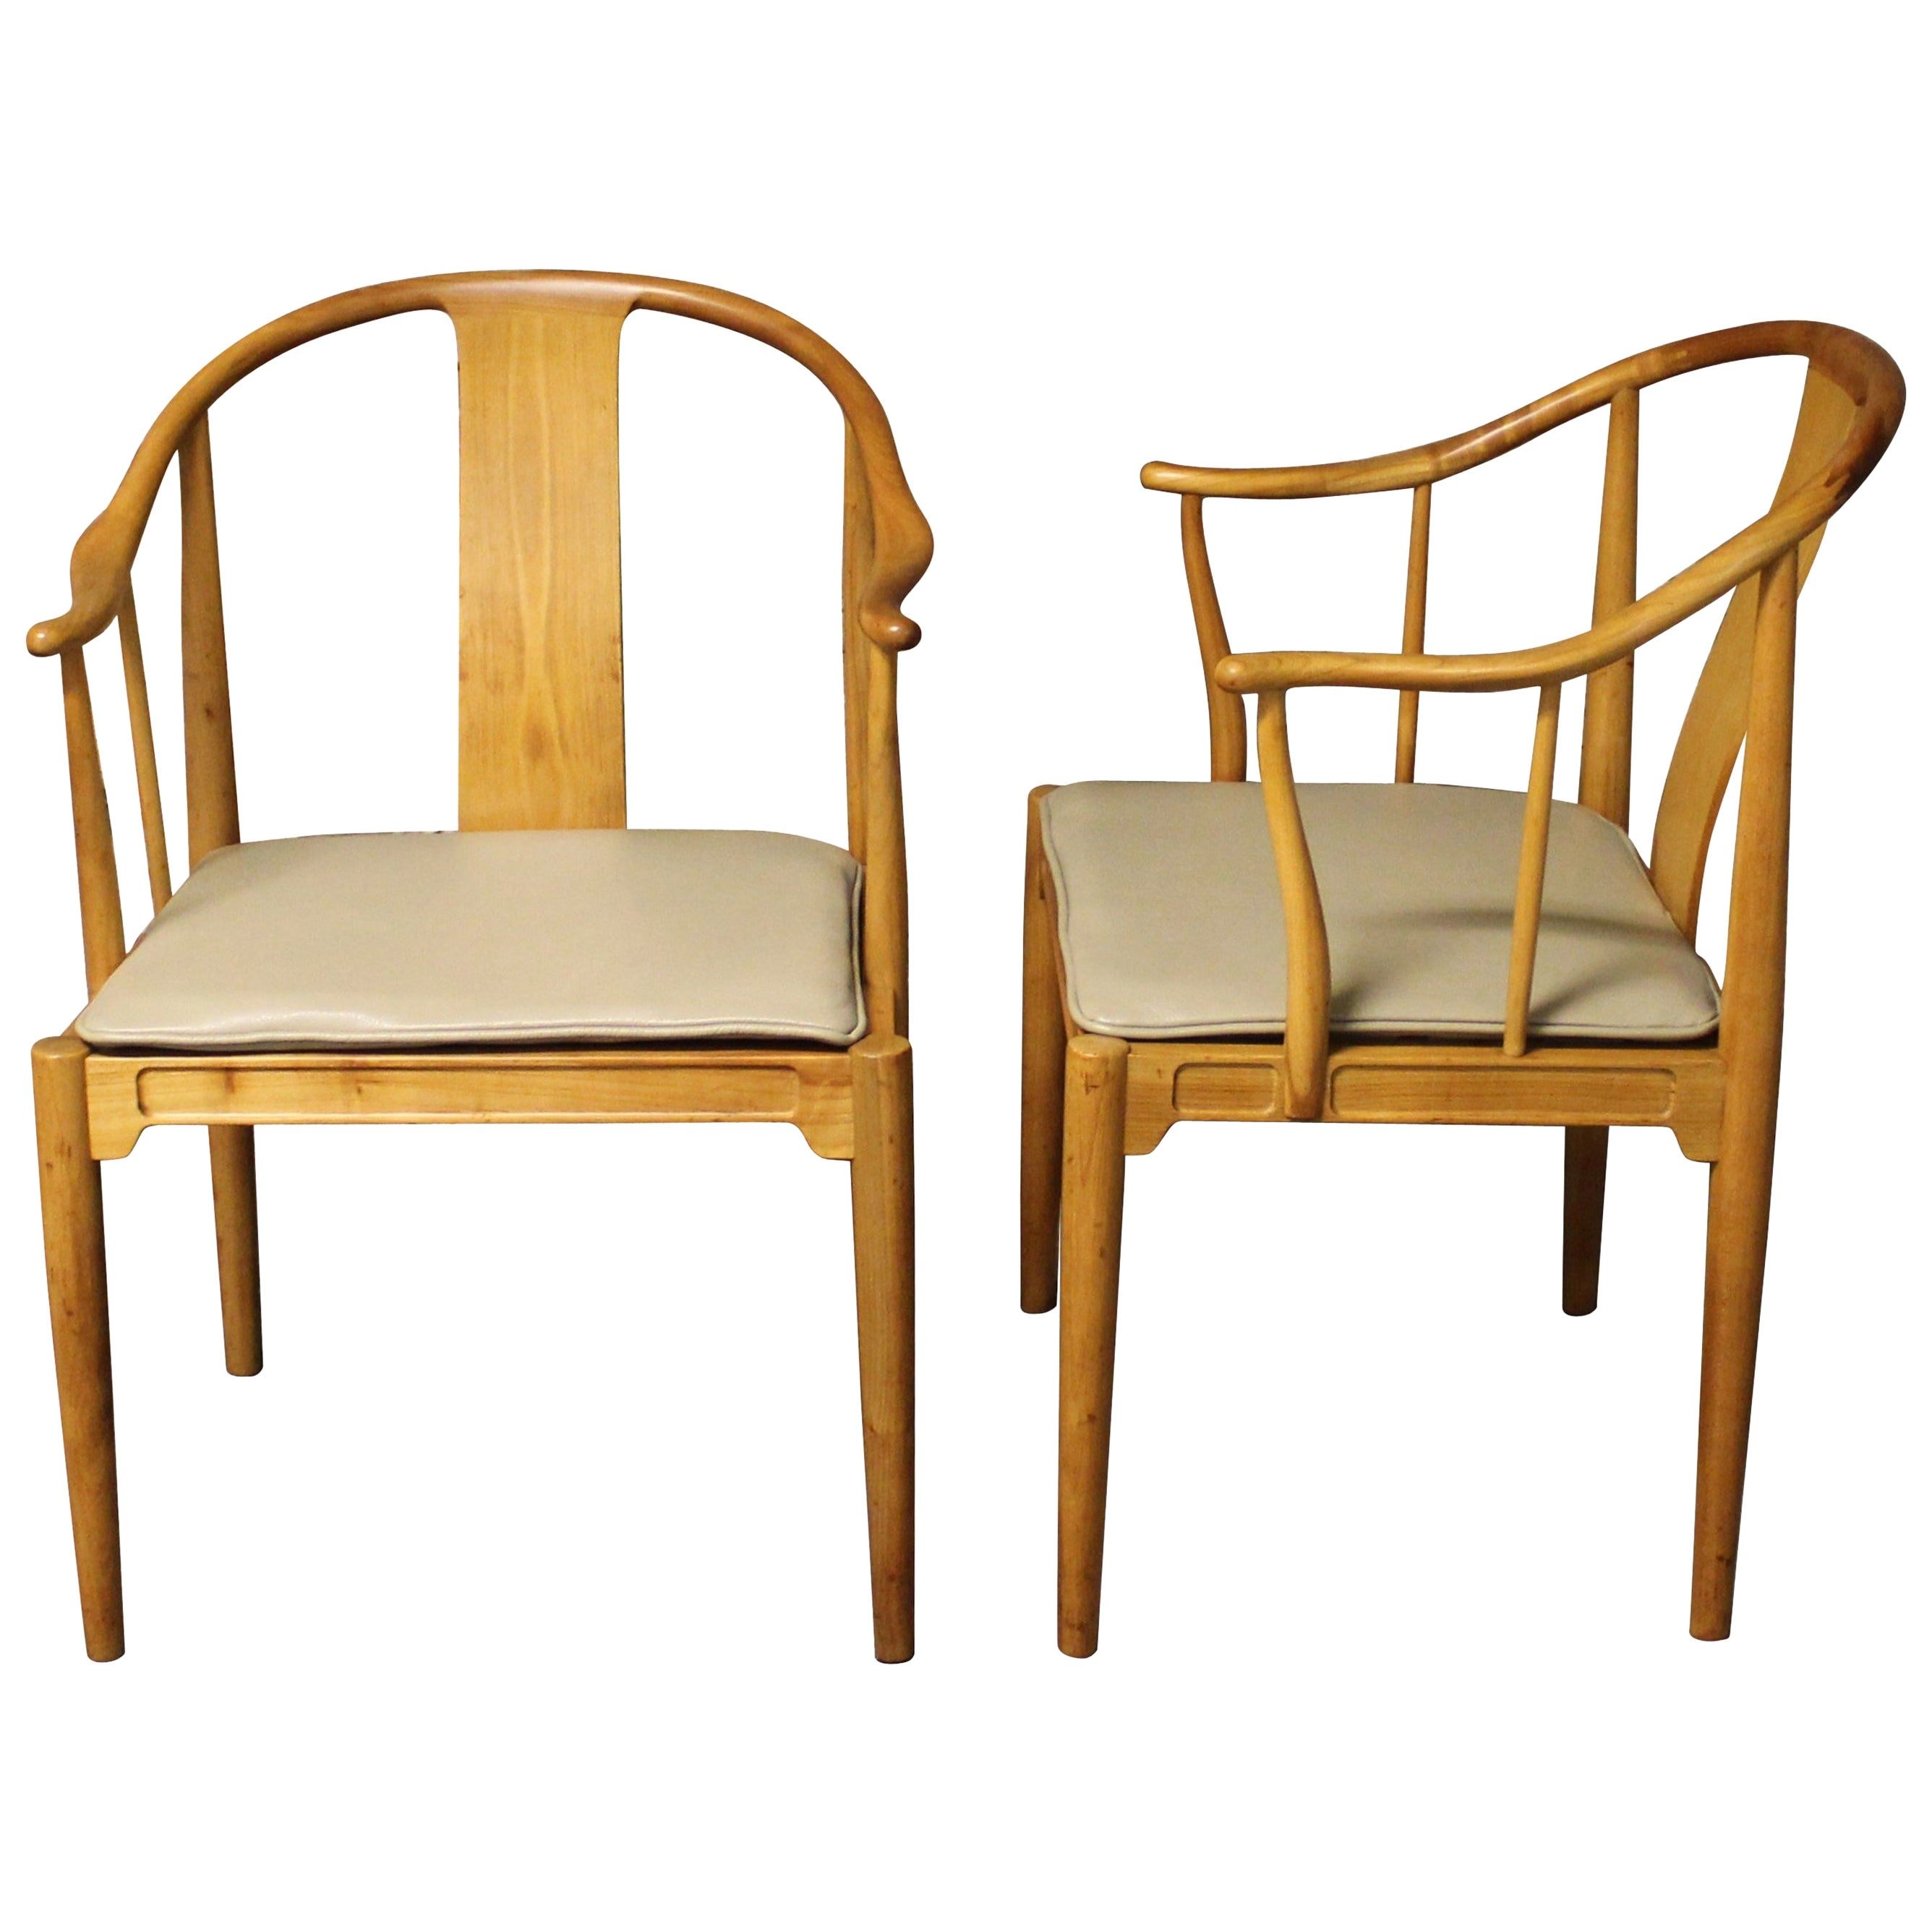 Pair of Hans Wegner Chinese Chairs for Fritz Hansen